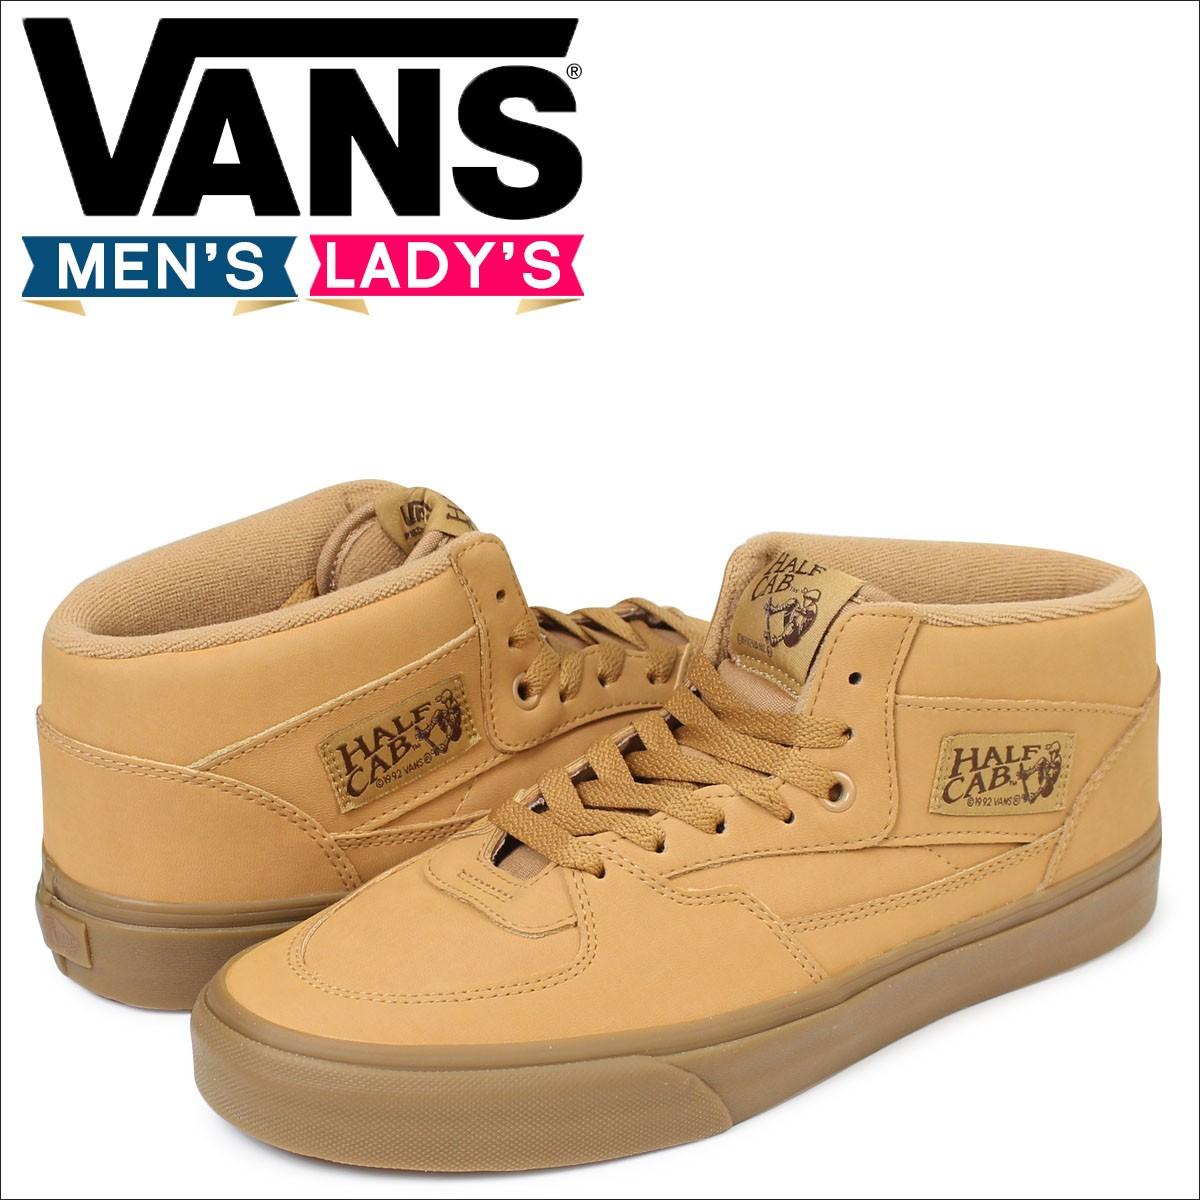 VANS HALF CAB スニーカー メンズ レディース バンズ ヴァンズ VN0A348EOTS 靴 ブラウン [1/23 追加入荷]